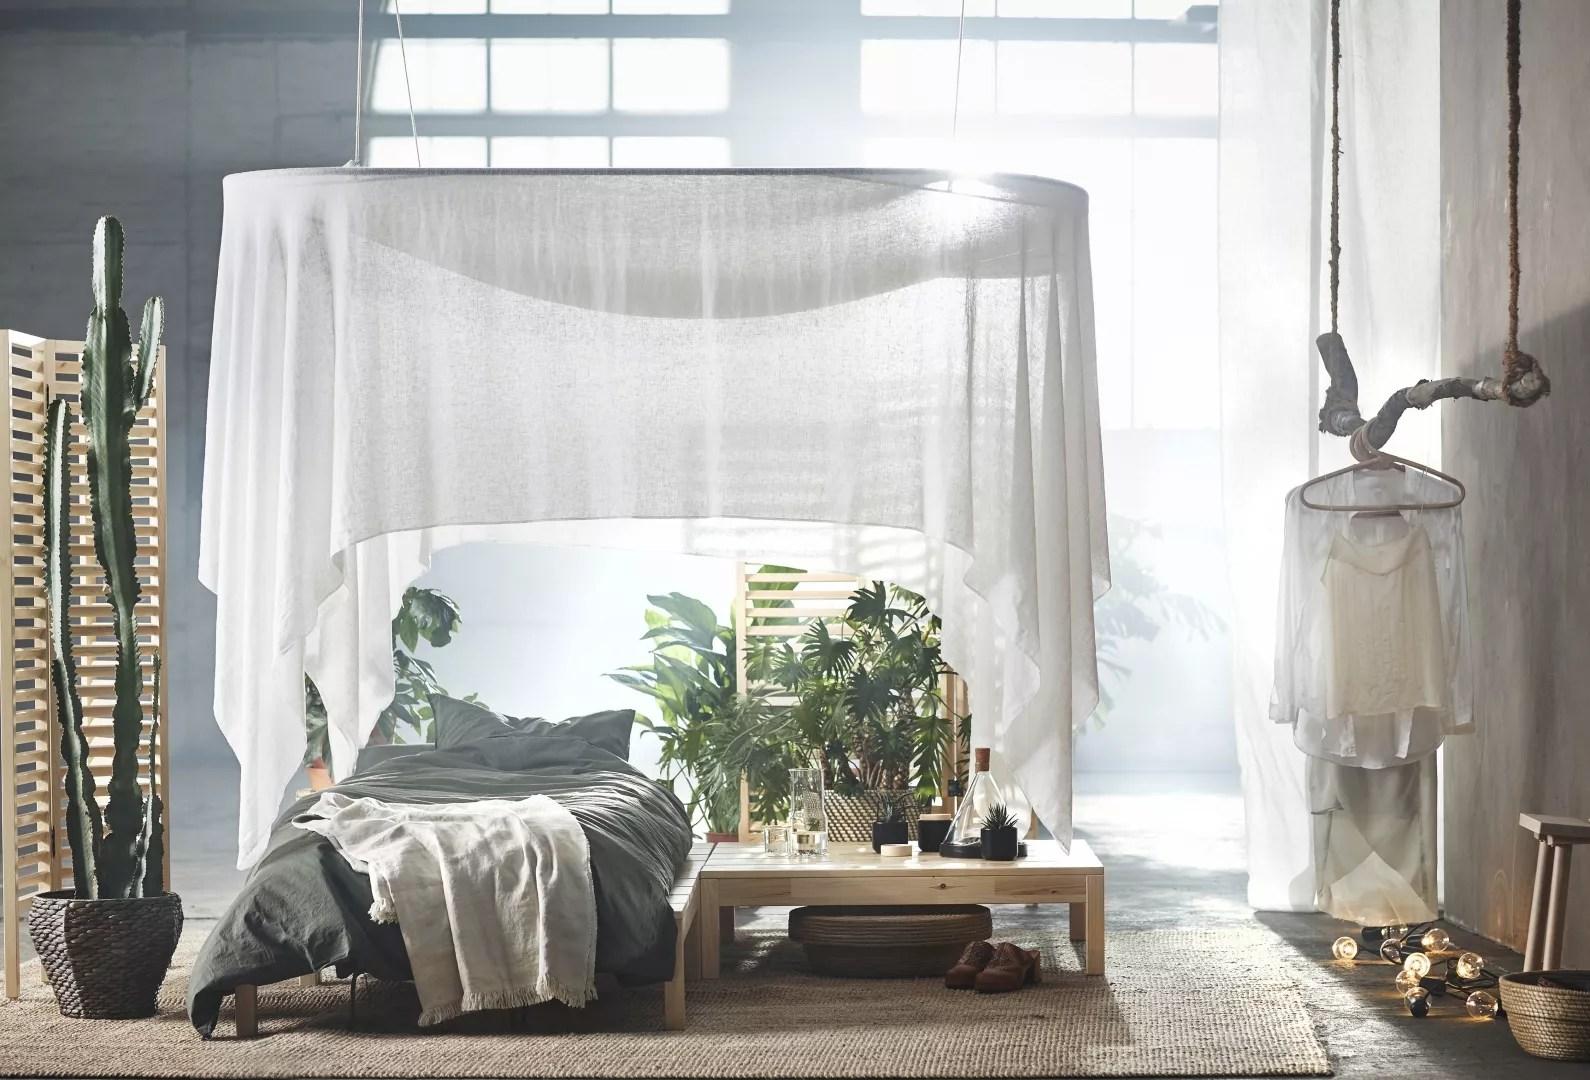 Interieur Kaptafel Styling : Interieur archieven u pagina van u stijlvol styling